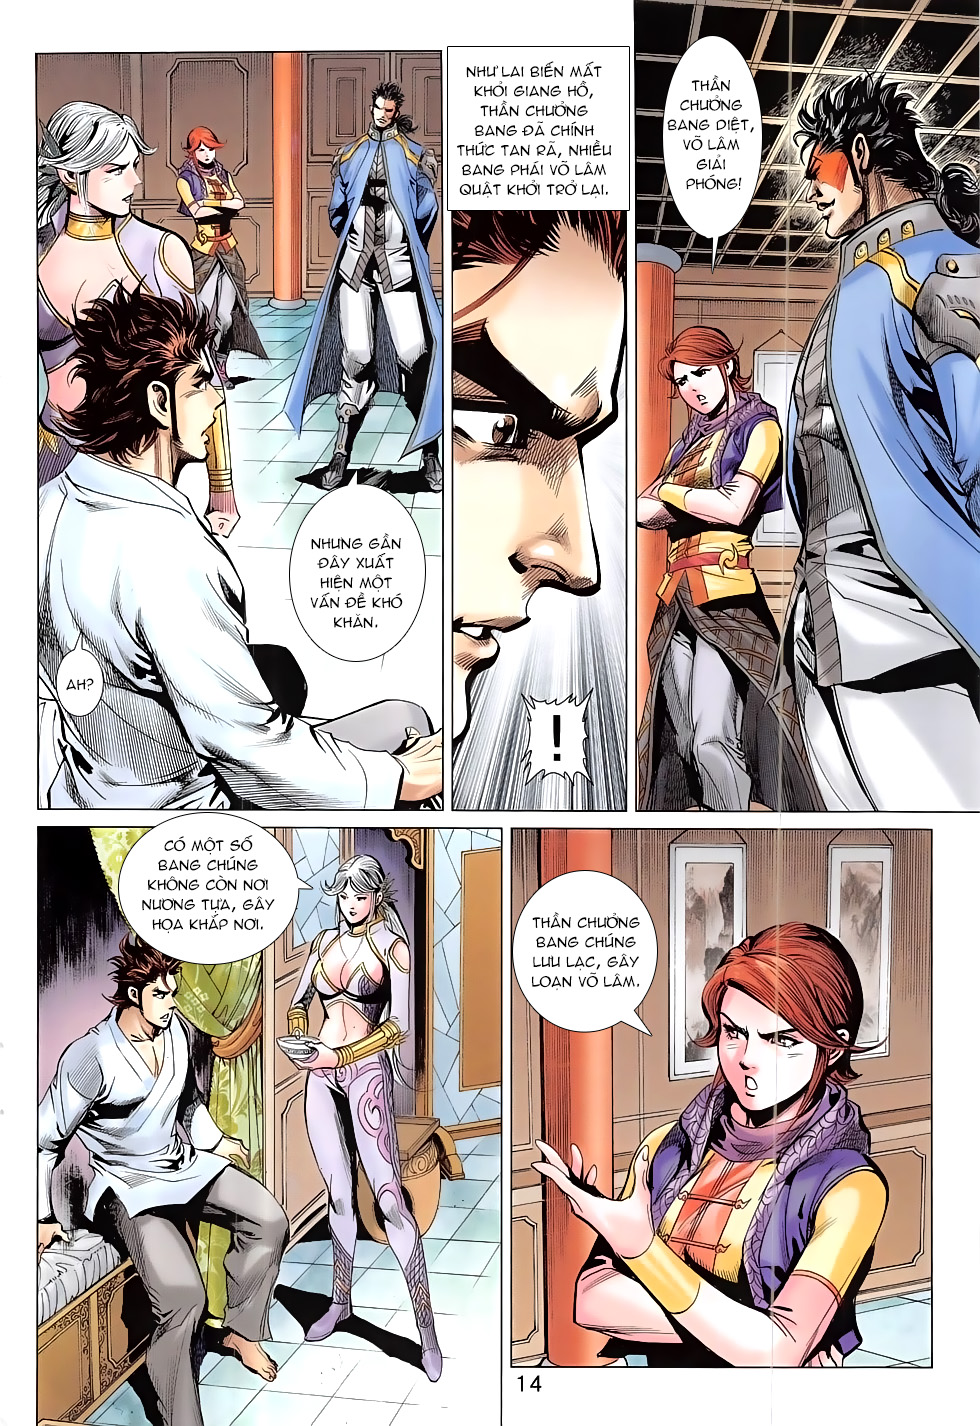 Thần Chưởng chap 24 – End Trang 14 - Mangak.info